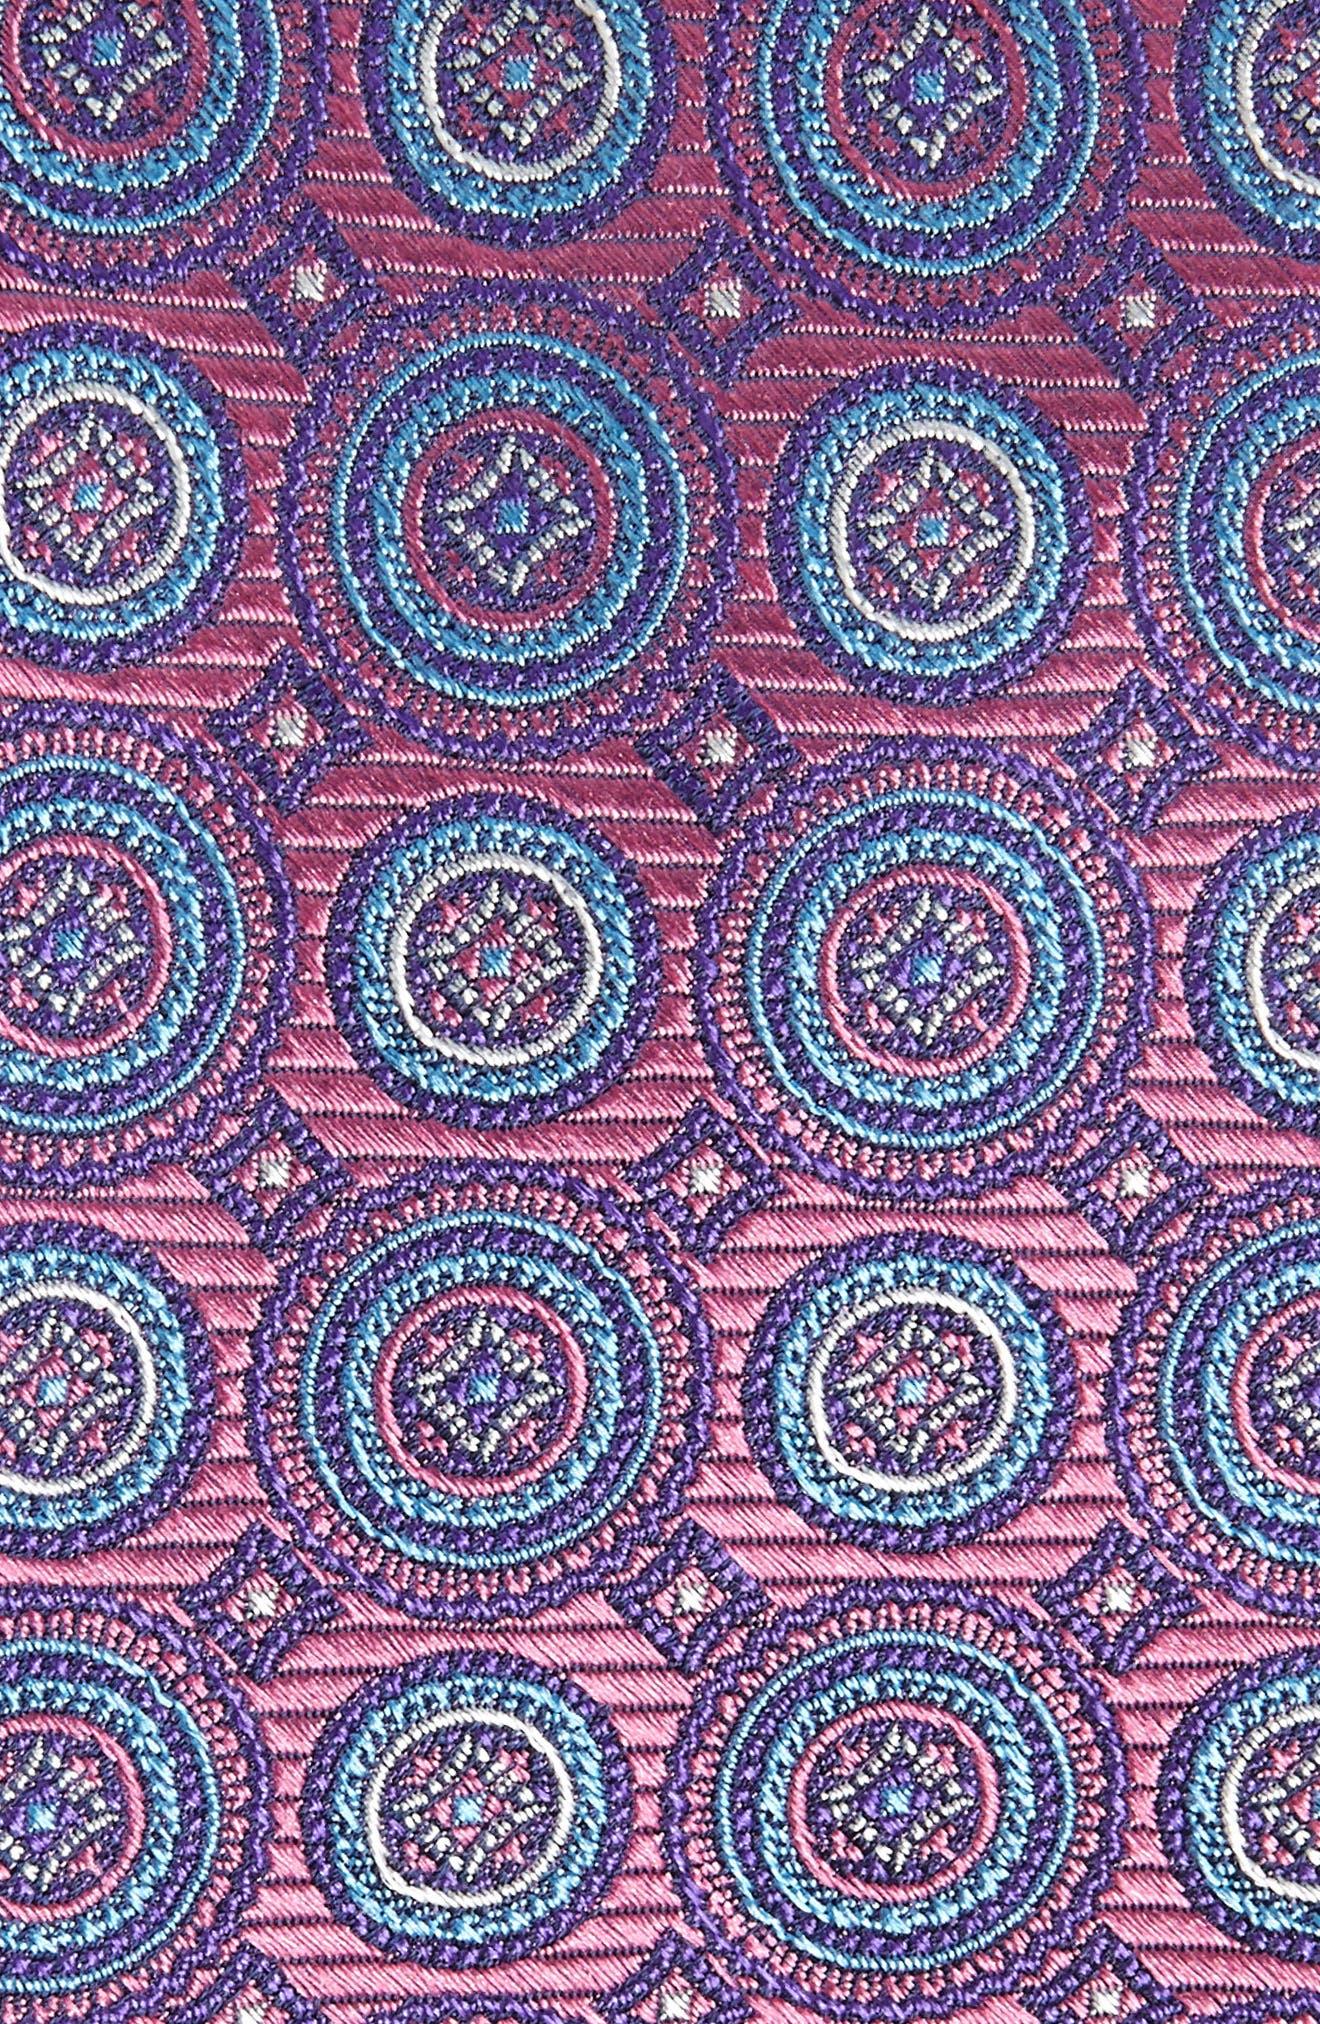 Santa Lucia Circles Silk Tie,                             Alternate thumbnail 2, color,                             510